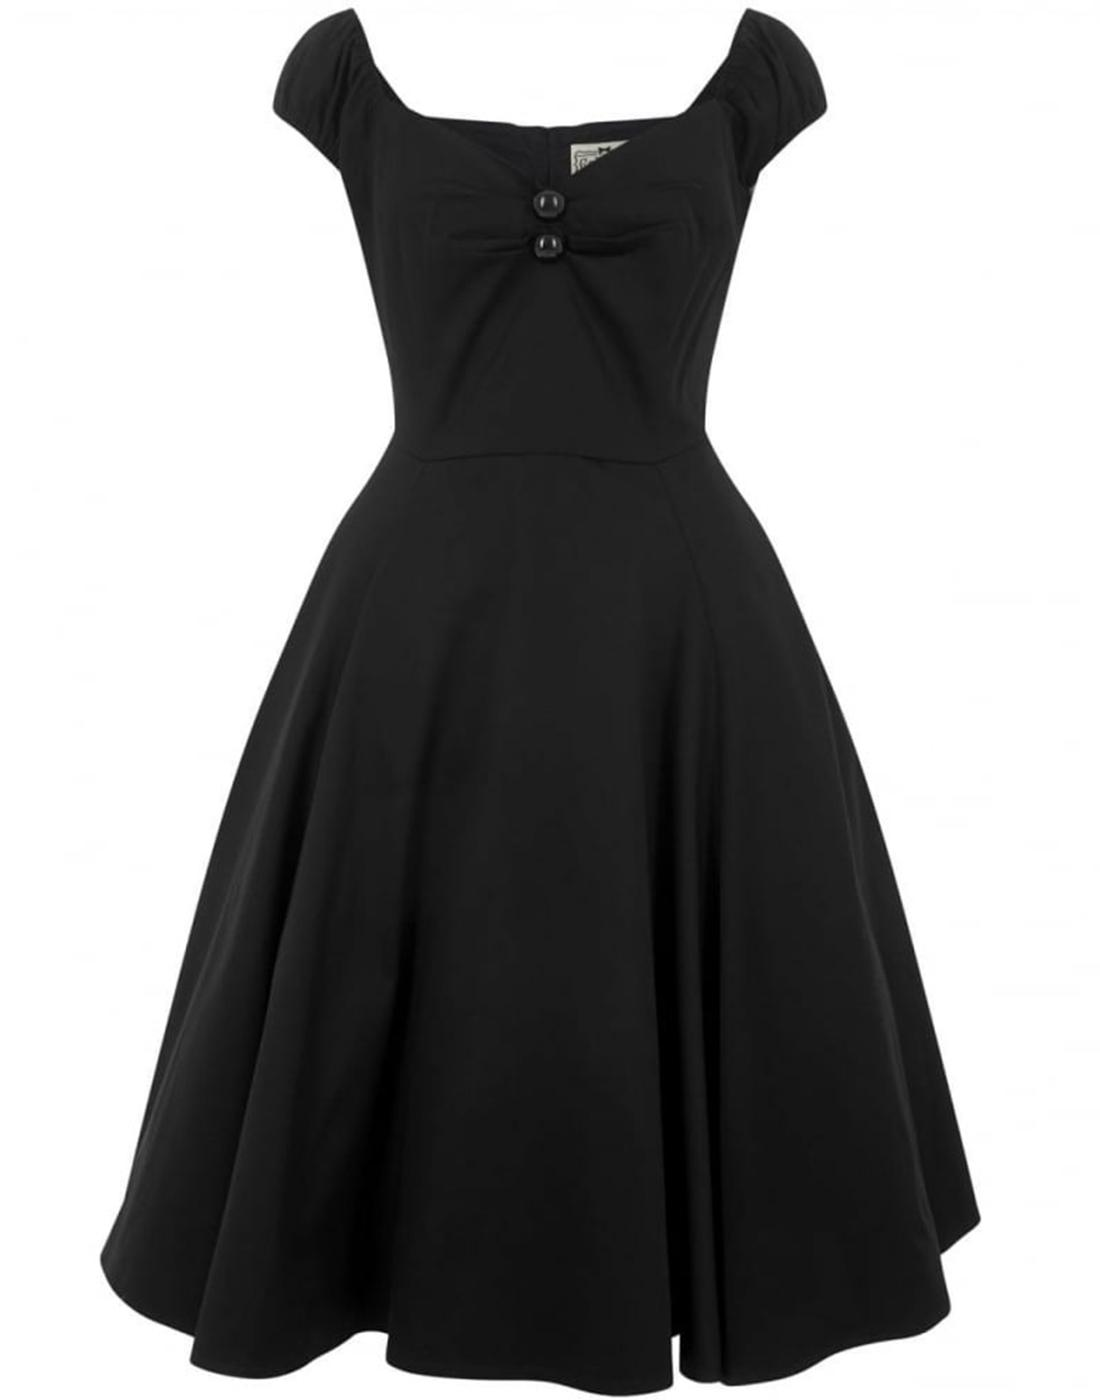 Dolores COLLECTIF Vintage 1950s Doll Dress (Black)